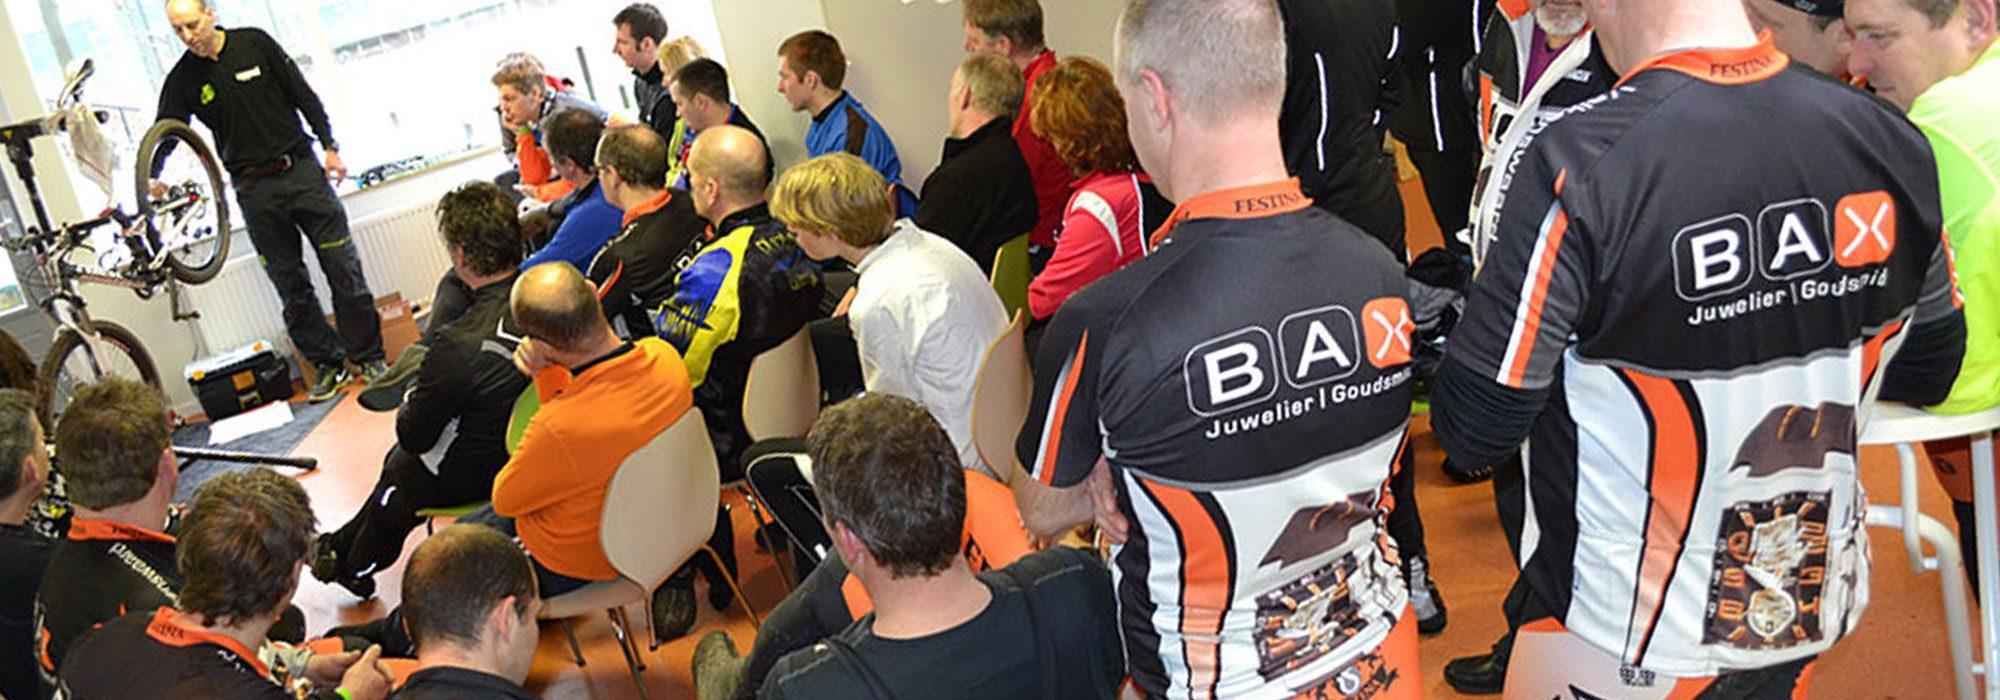 mtbclinic.nl mountainbike clinics lezing